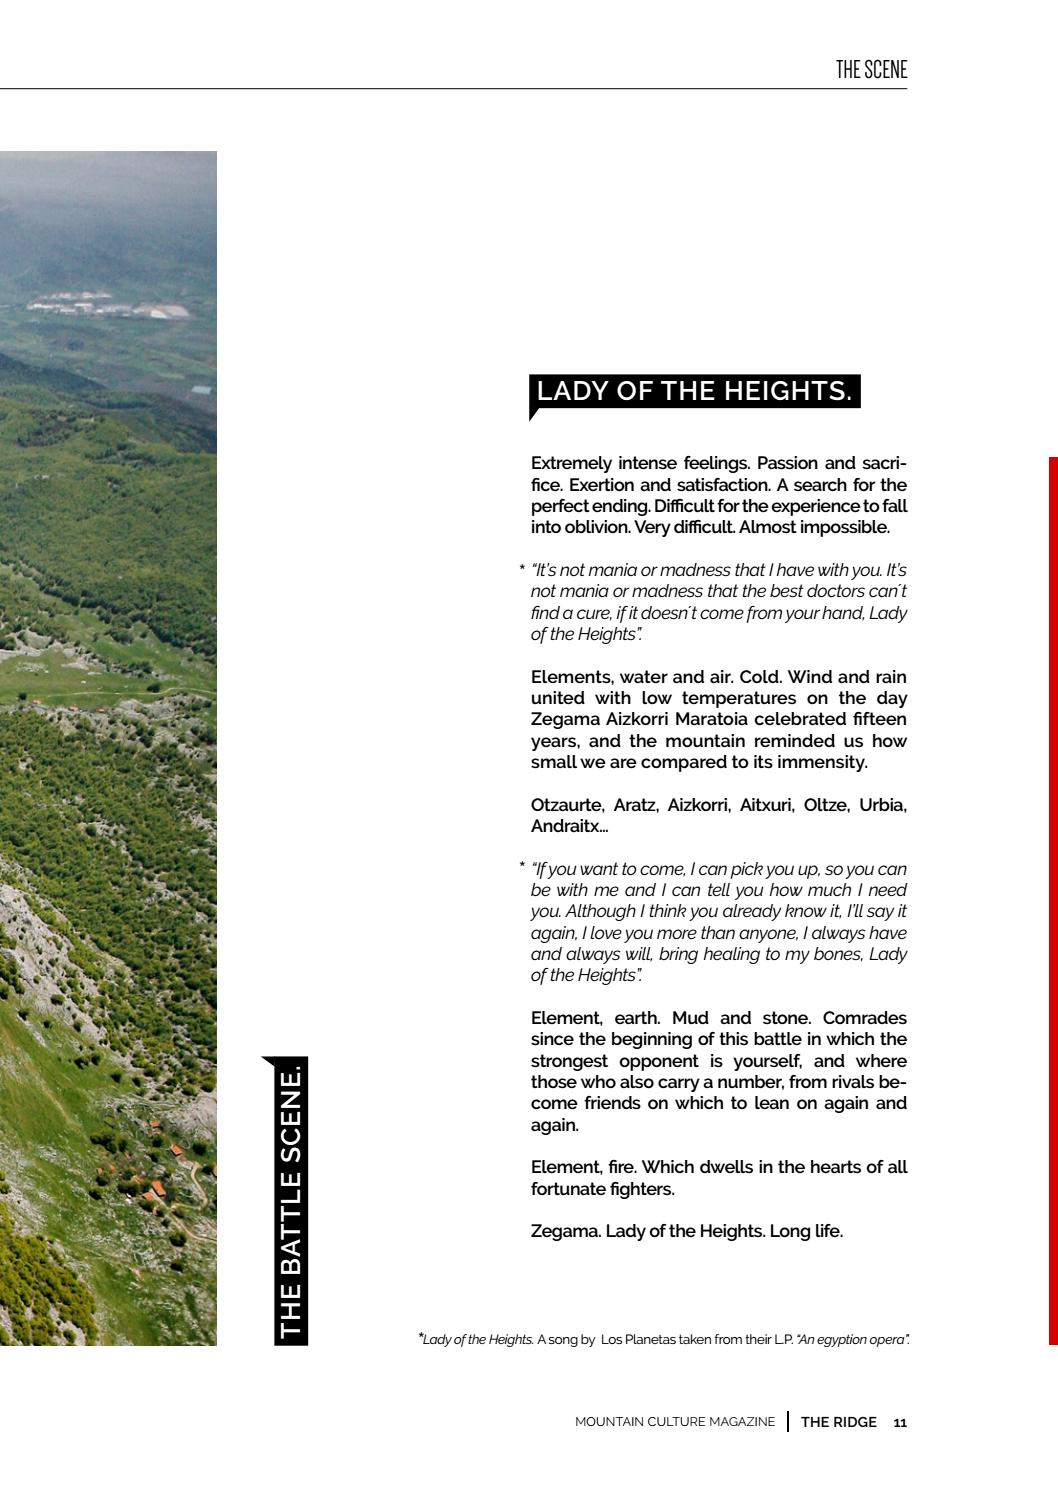 The Ridge [001]  Vertigo by kissthemountain - issuu